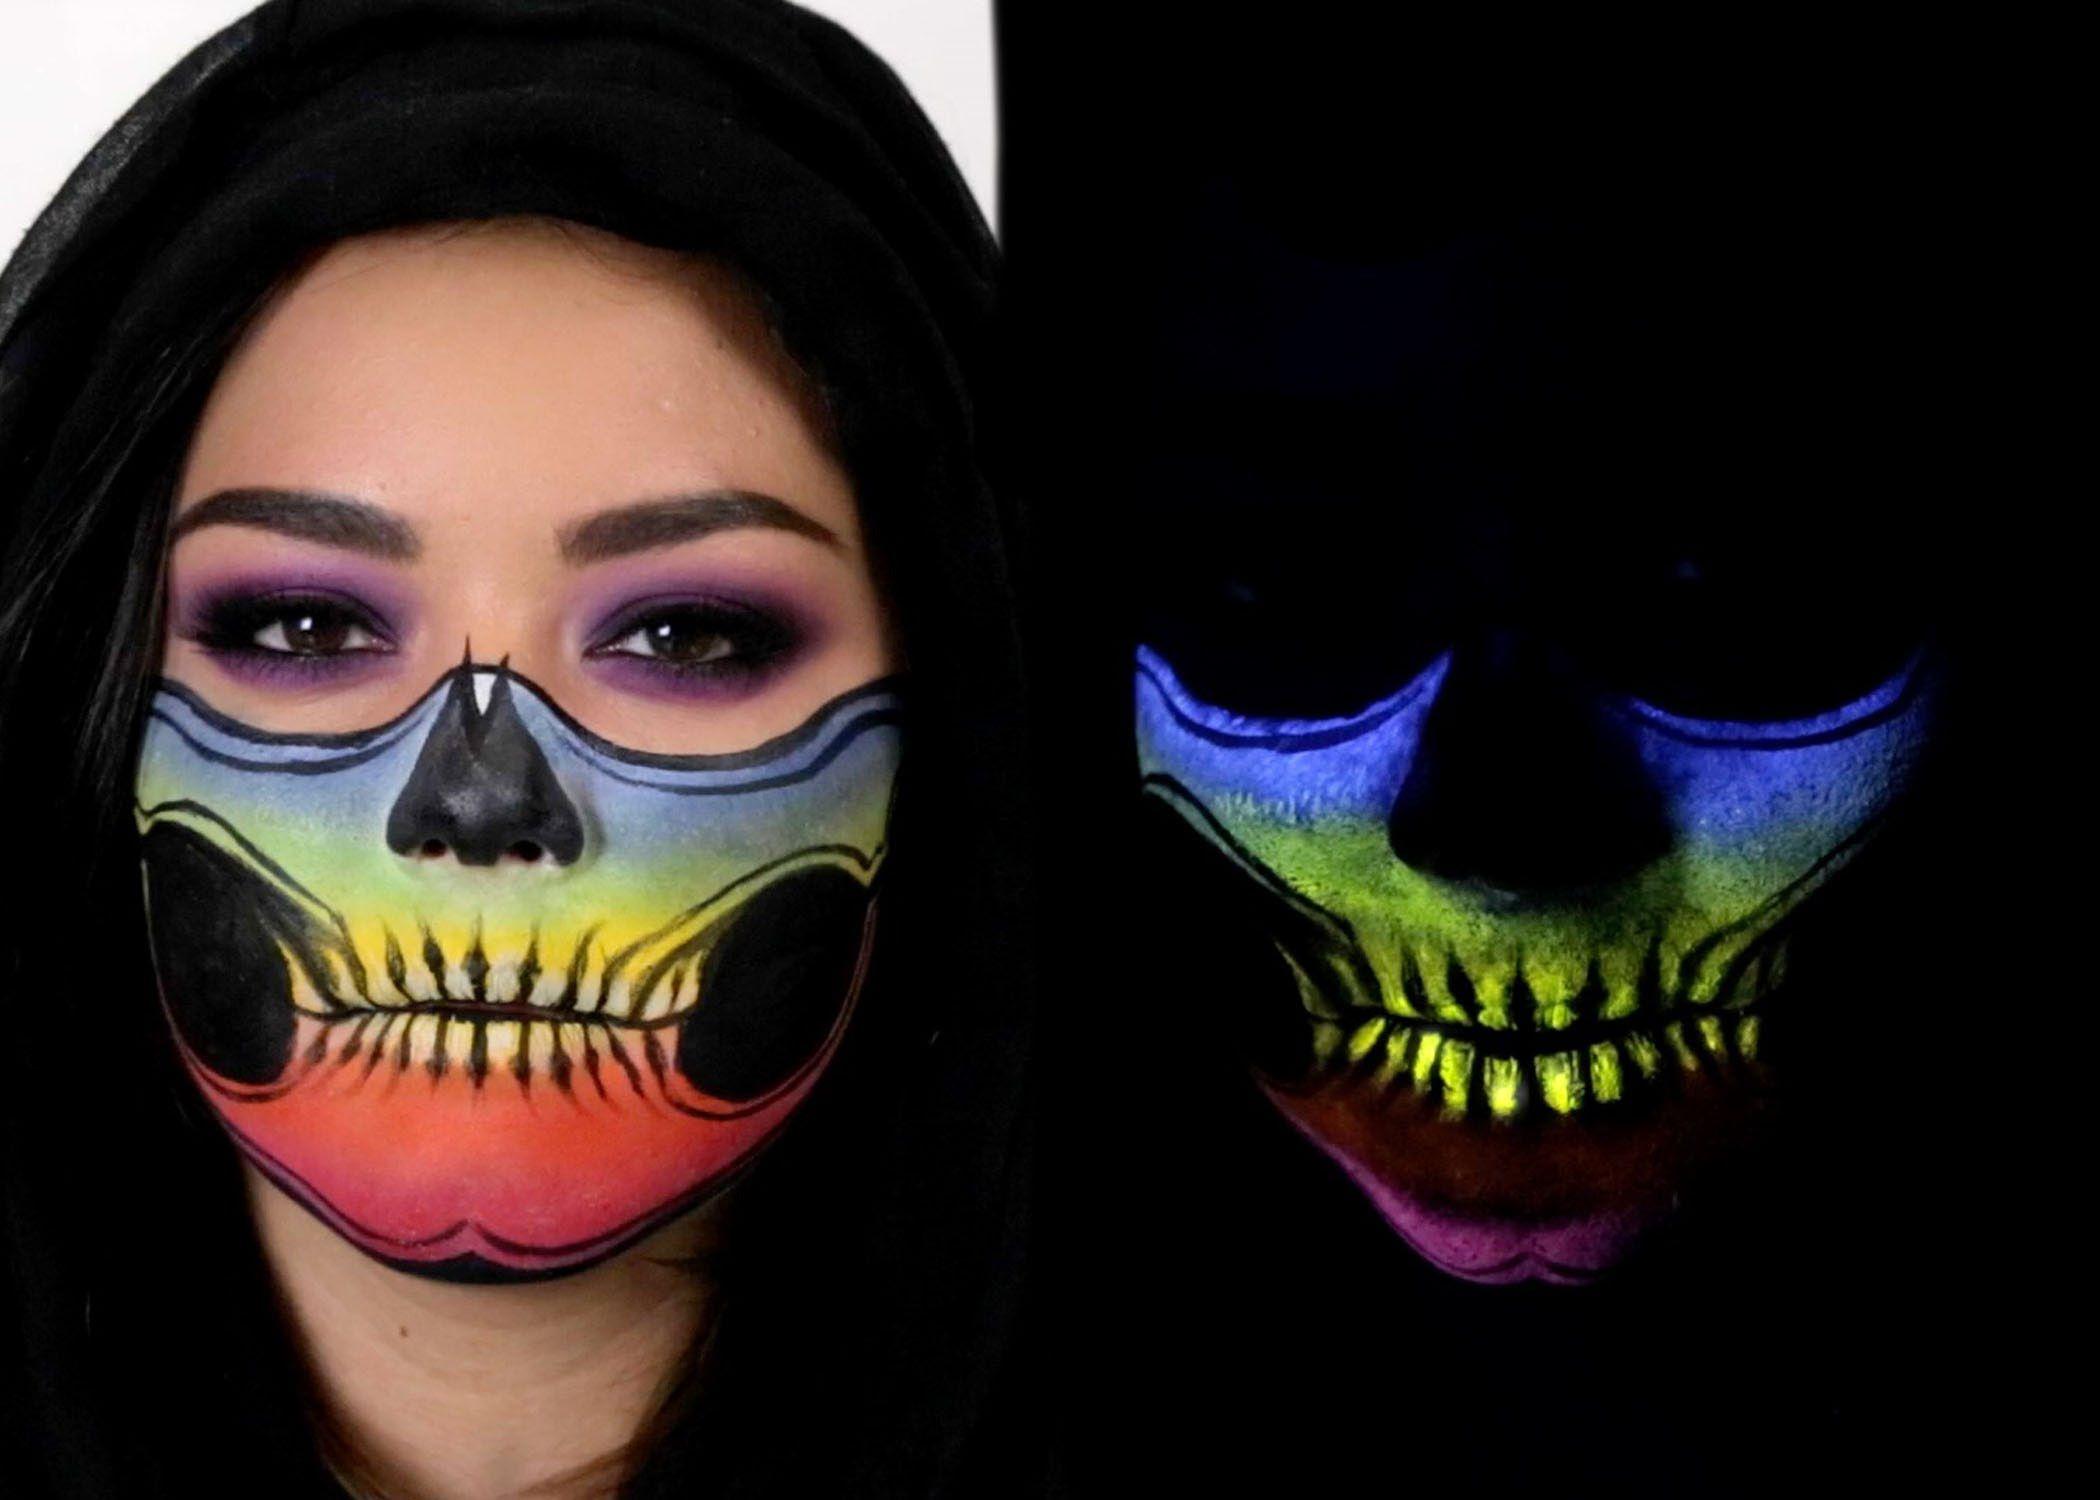 Skeleton Face Mask Glow In The Dark Halloween Makeup